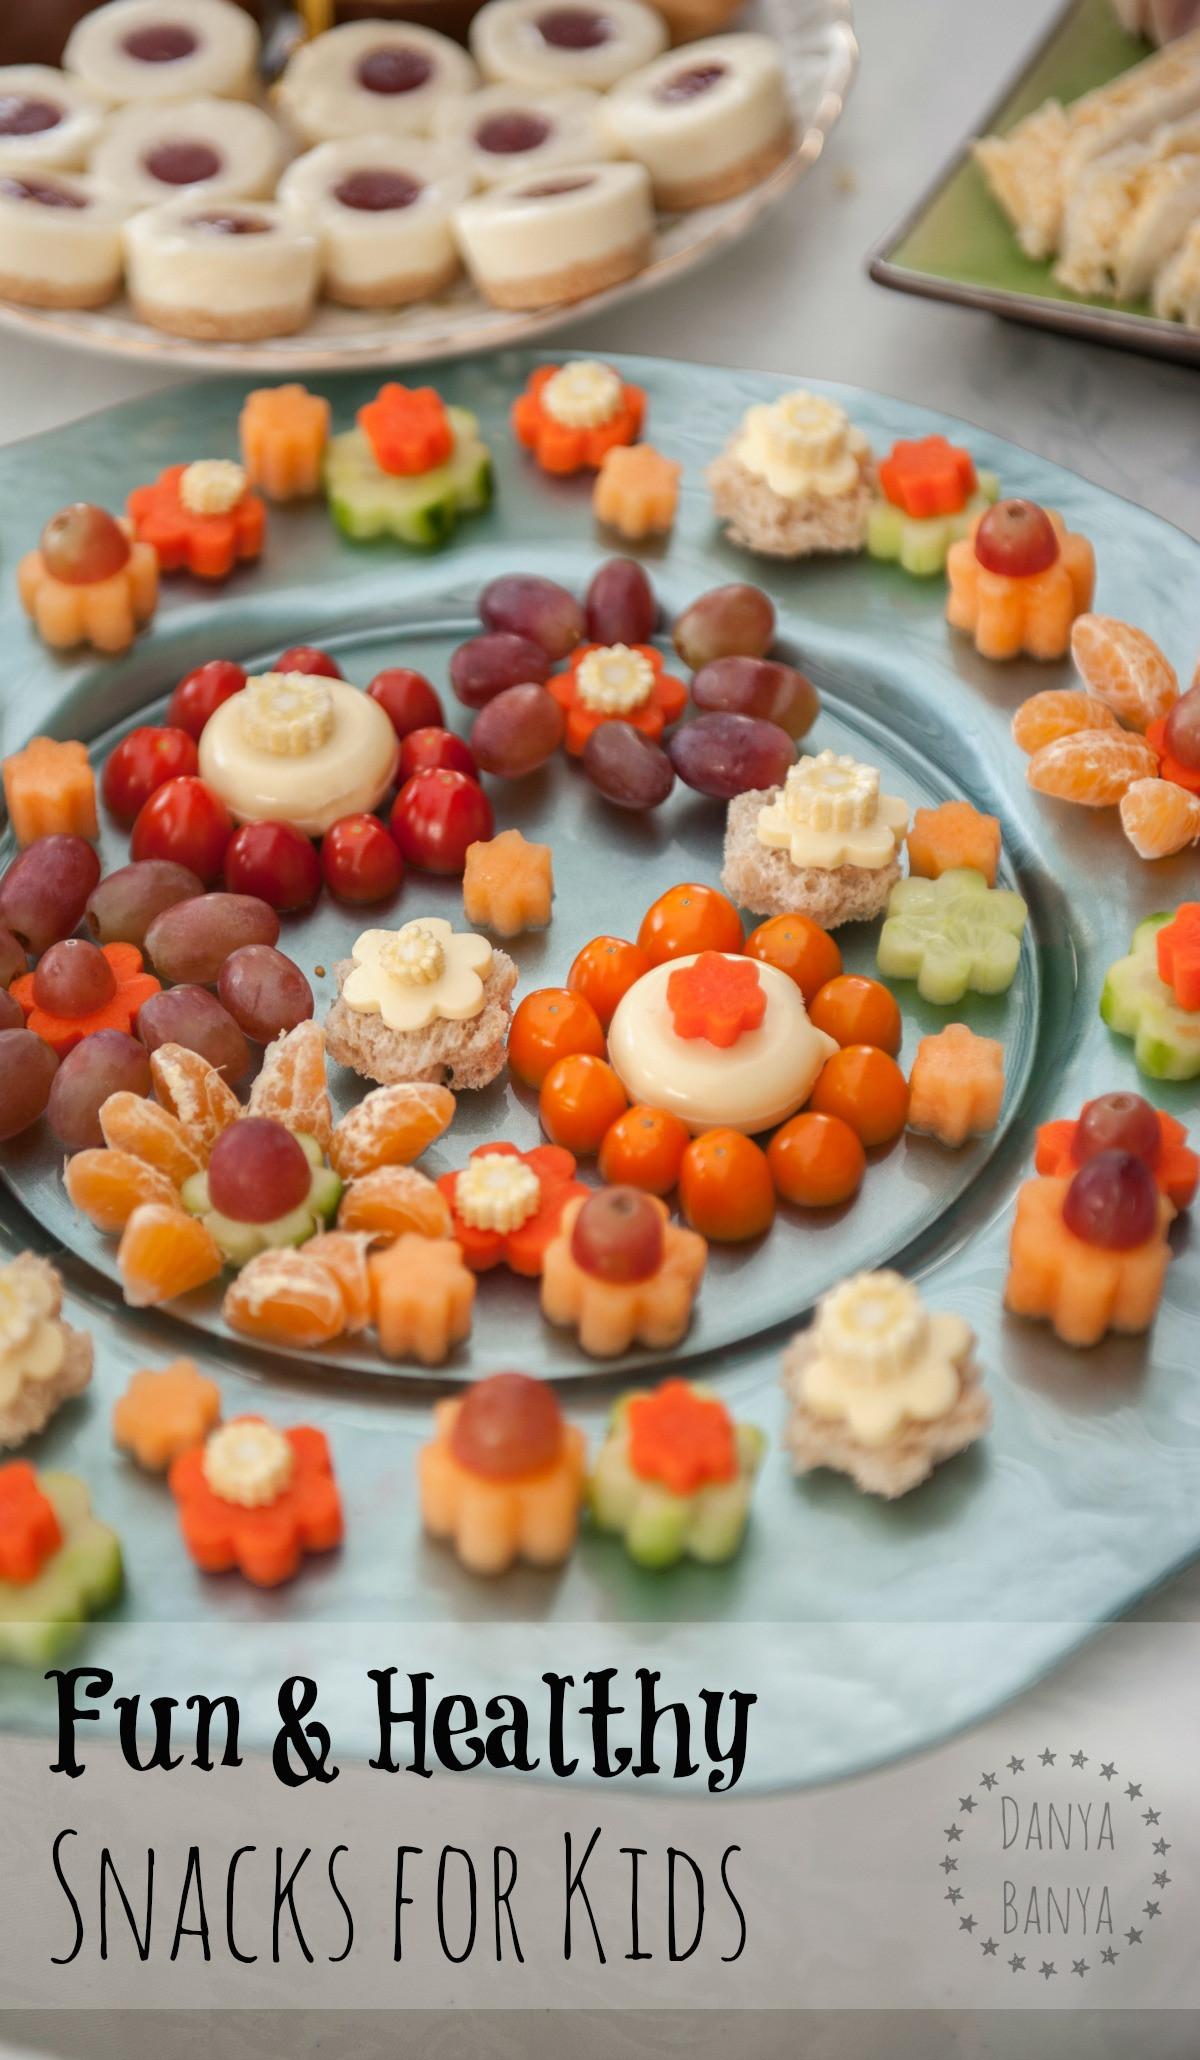 Healthy Snacks For Kids  Fun & Healthy Snacks for Kids – Danya Banya